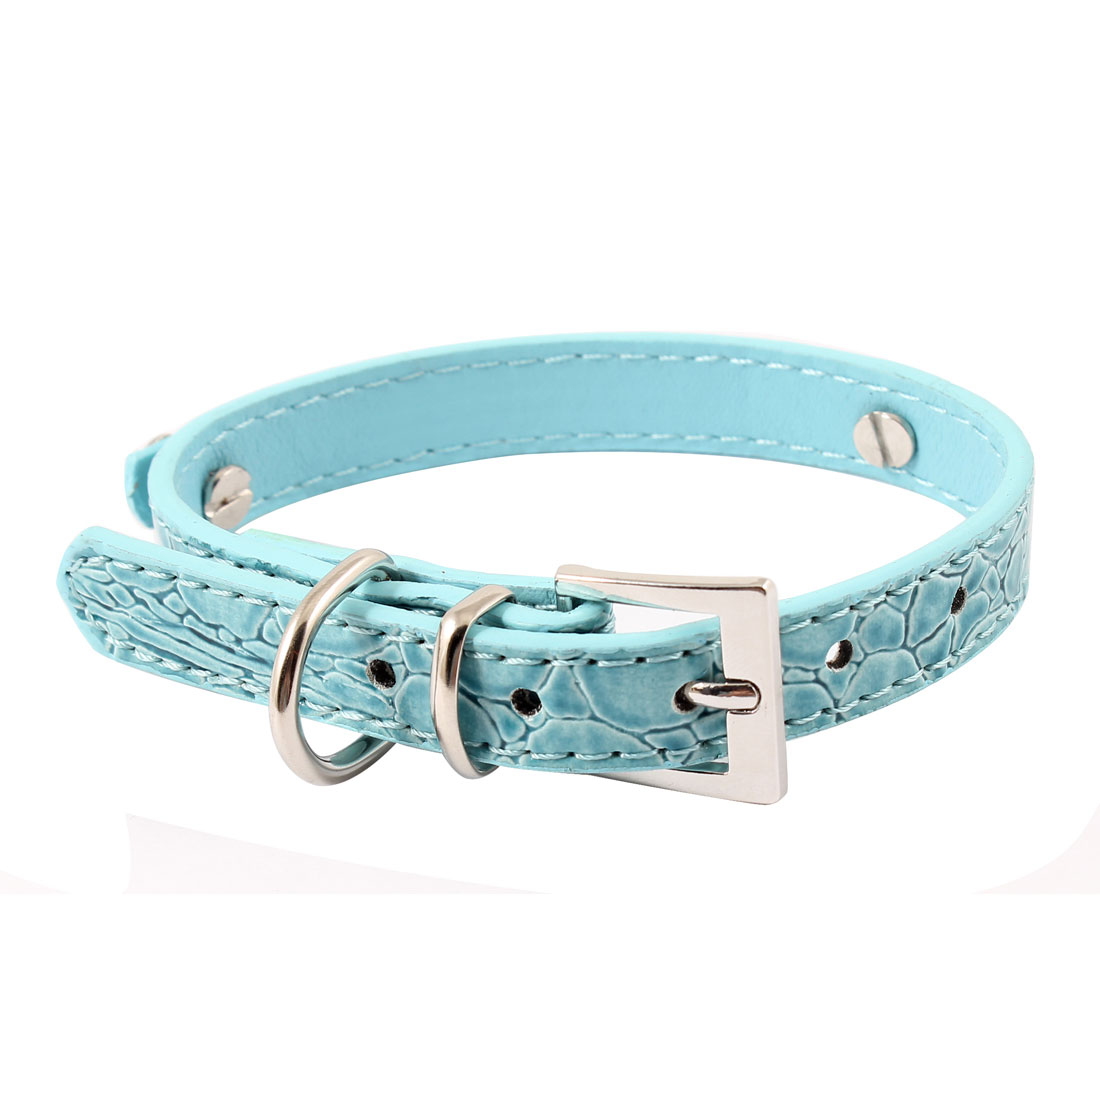 Single Pin Buckle Blue Alligator Pattern Pet Cat Tea Cup Poodle Dog Collar XS(China (Mainland))